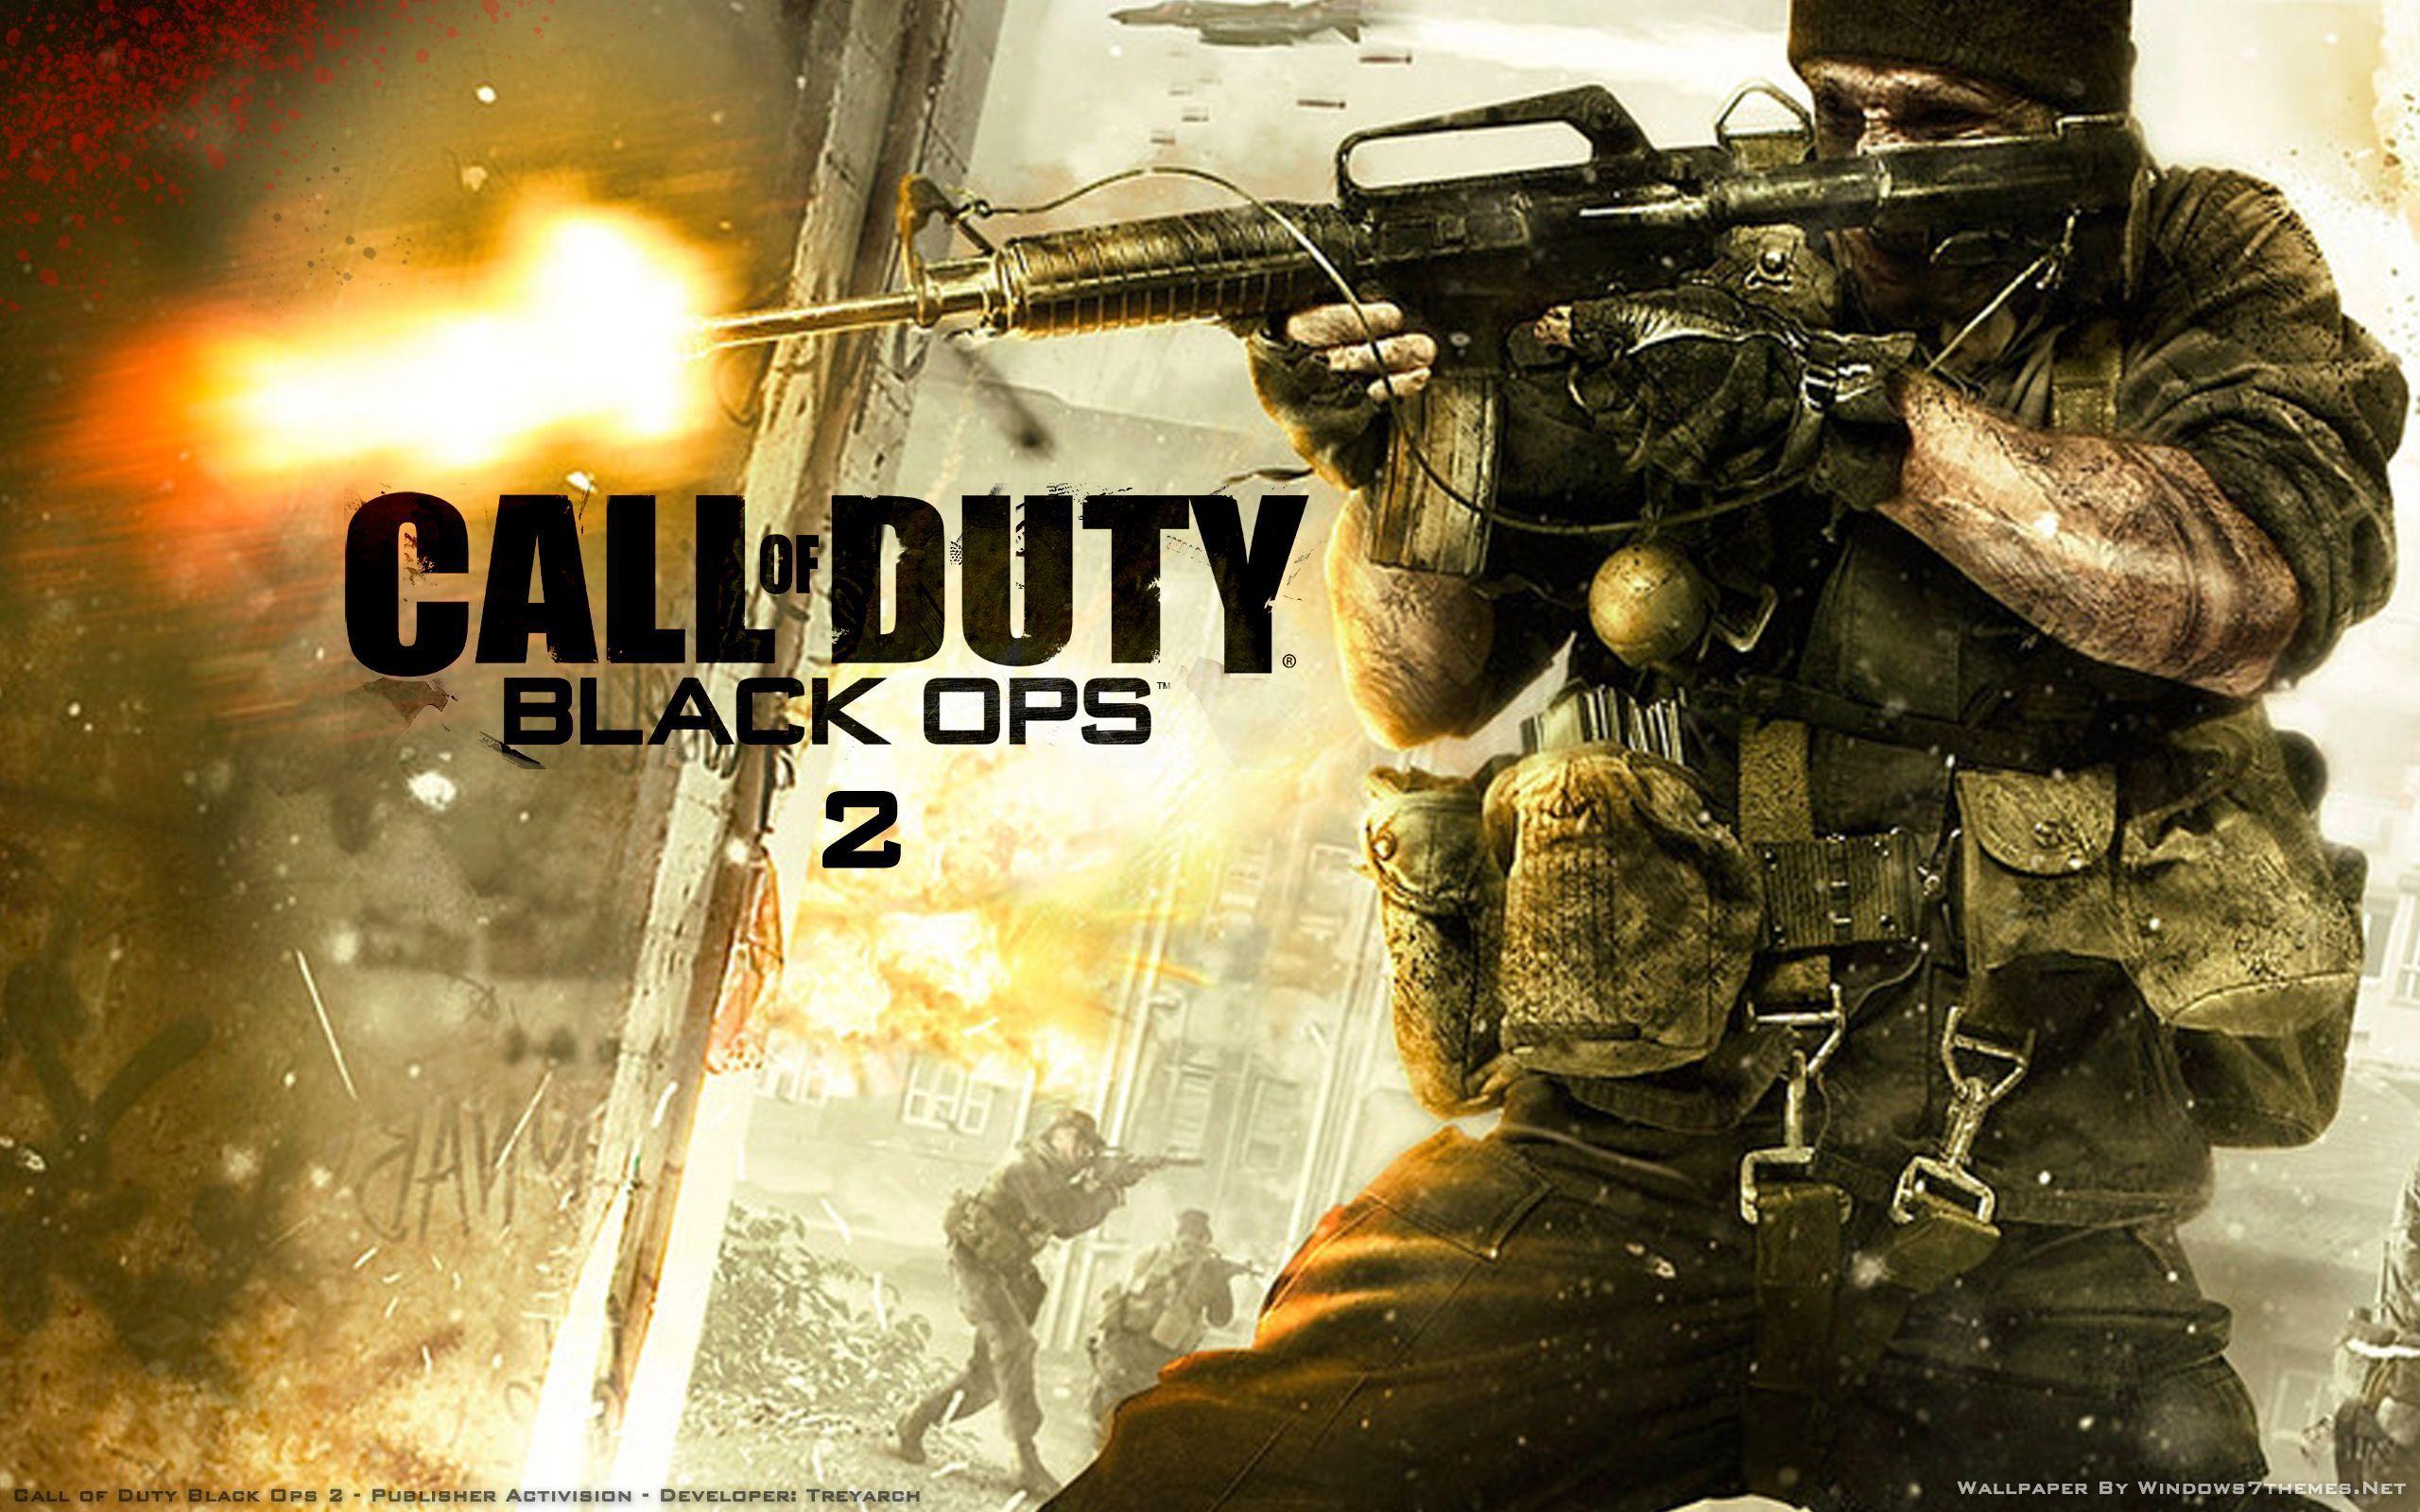 Call of duty black ops 2 wallpaper full hd 1920p